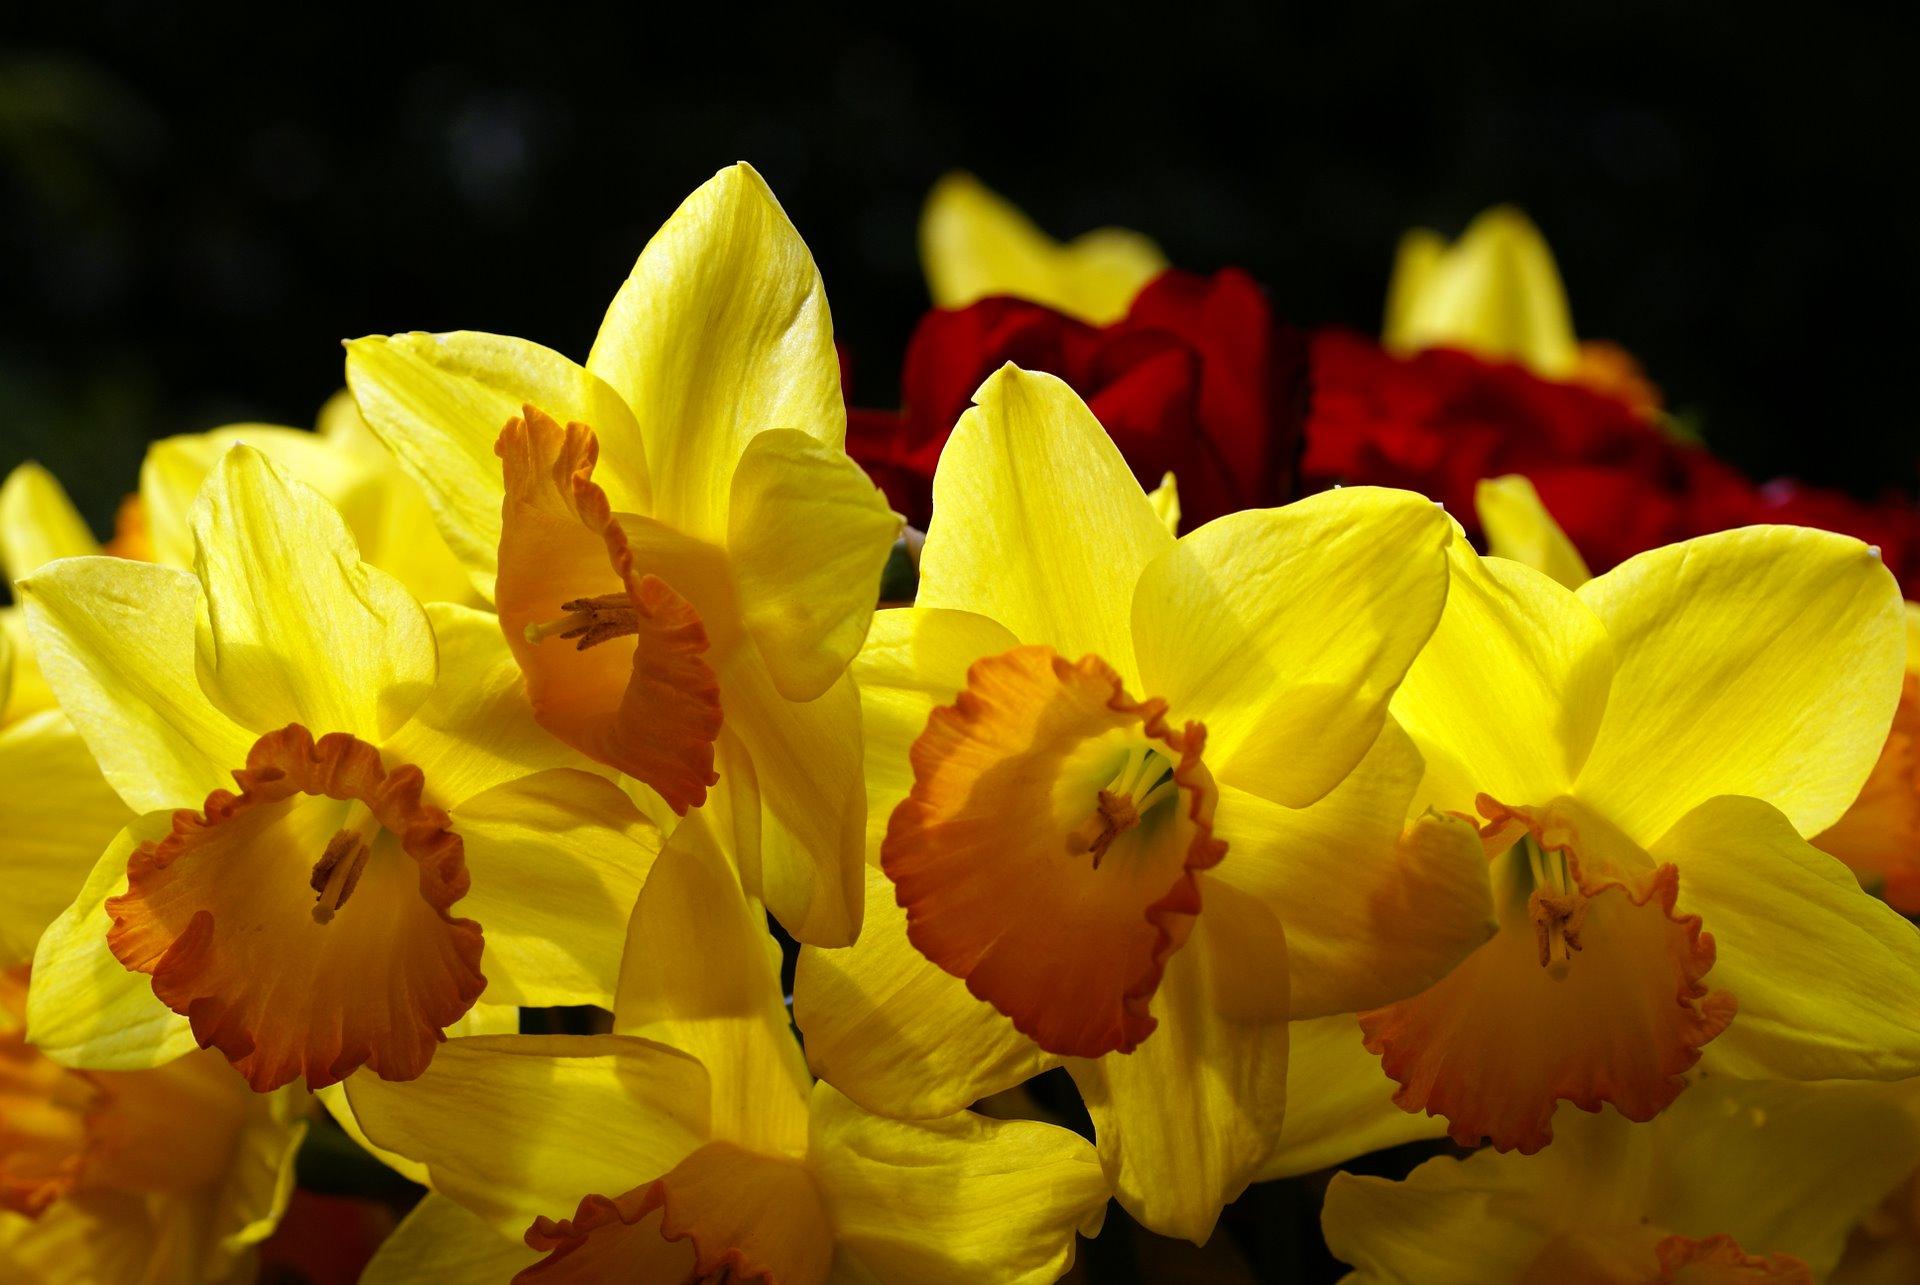 Yellow Daffodils Wallpaper Yellow Daffodils Photo